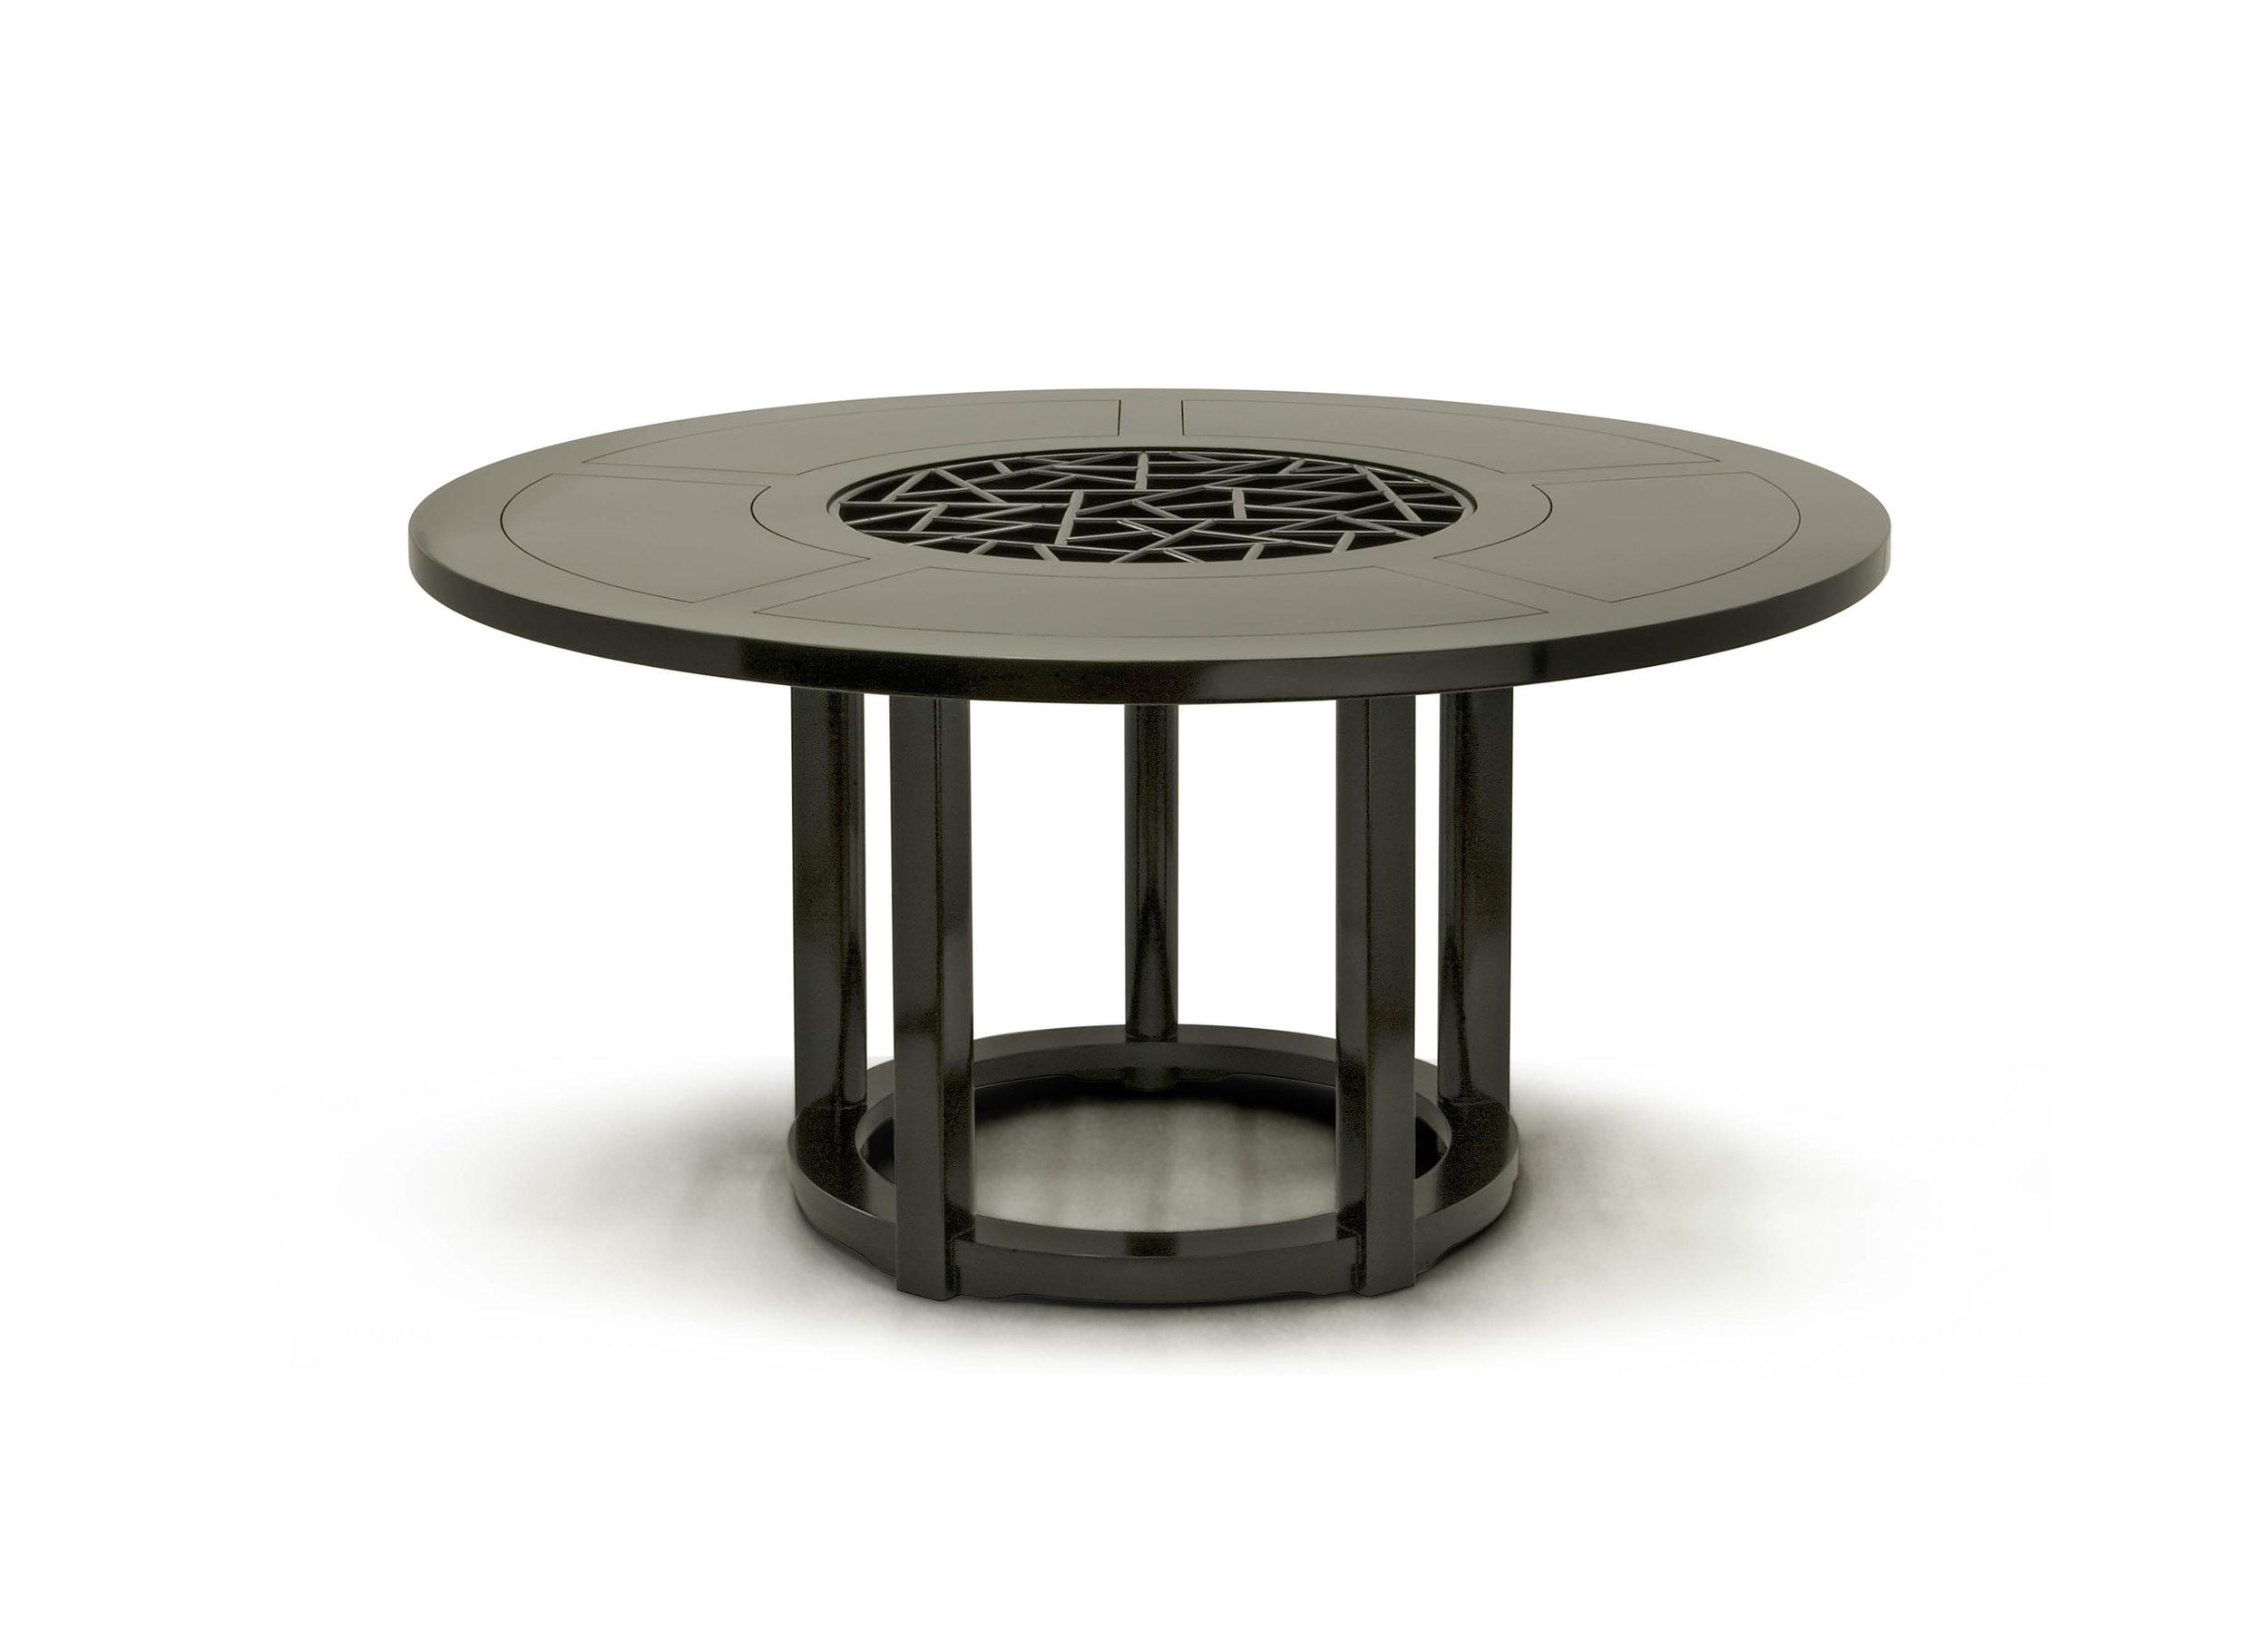 ....bespoke chinese ming style furniture : dining table ..特别定制中式明式家具 : 圆餐台....